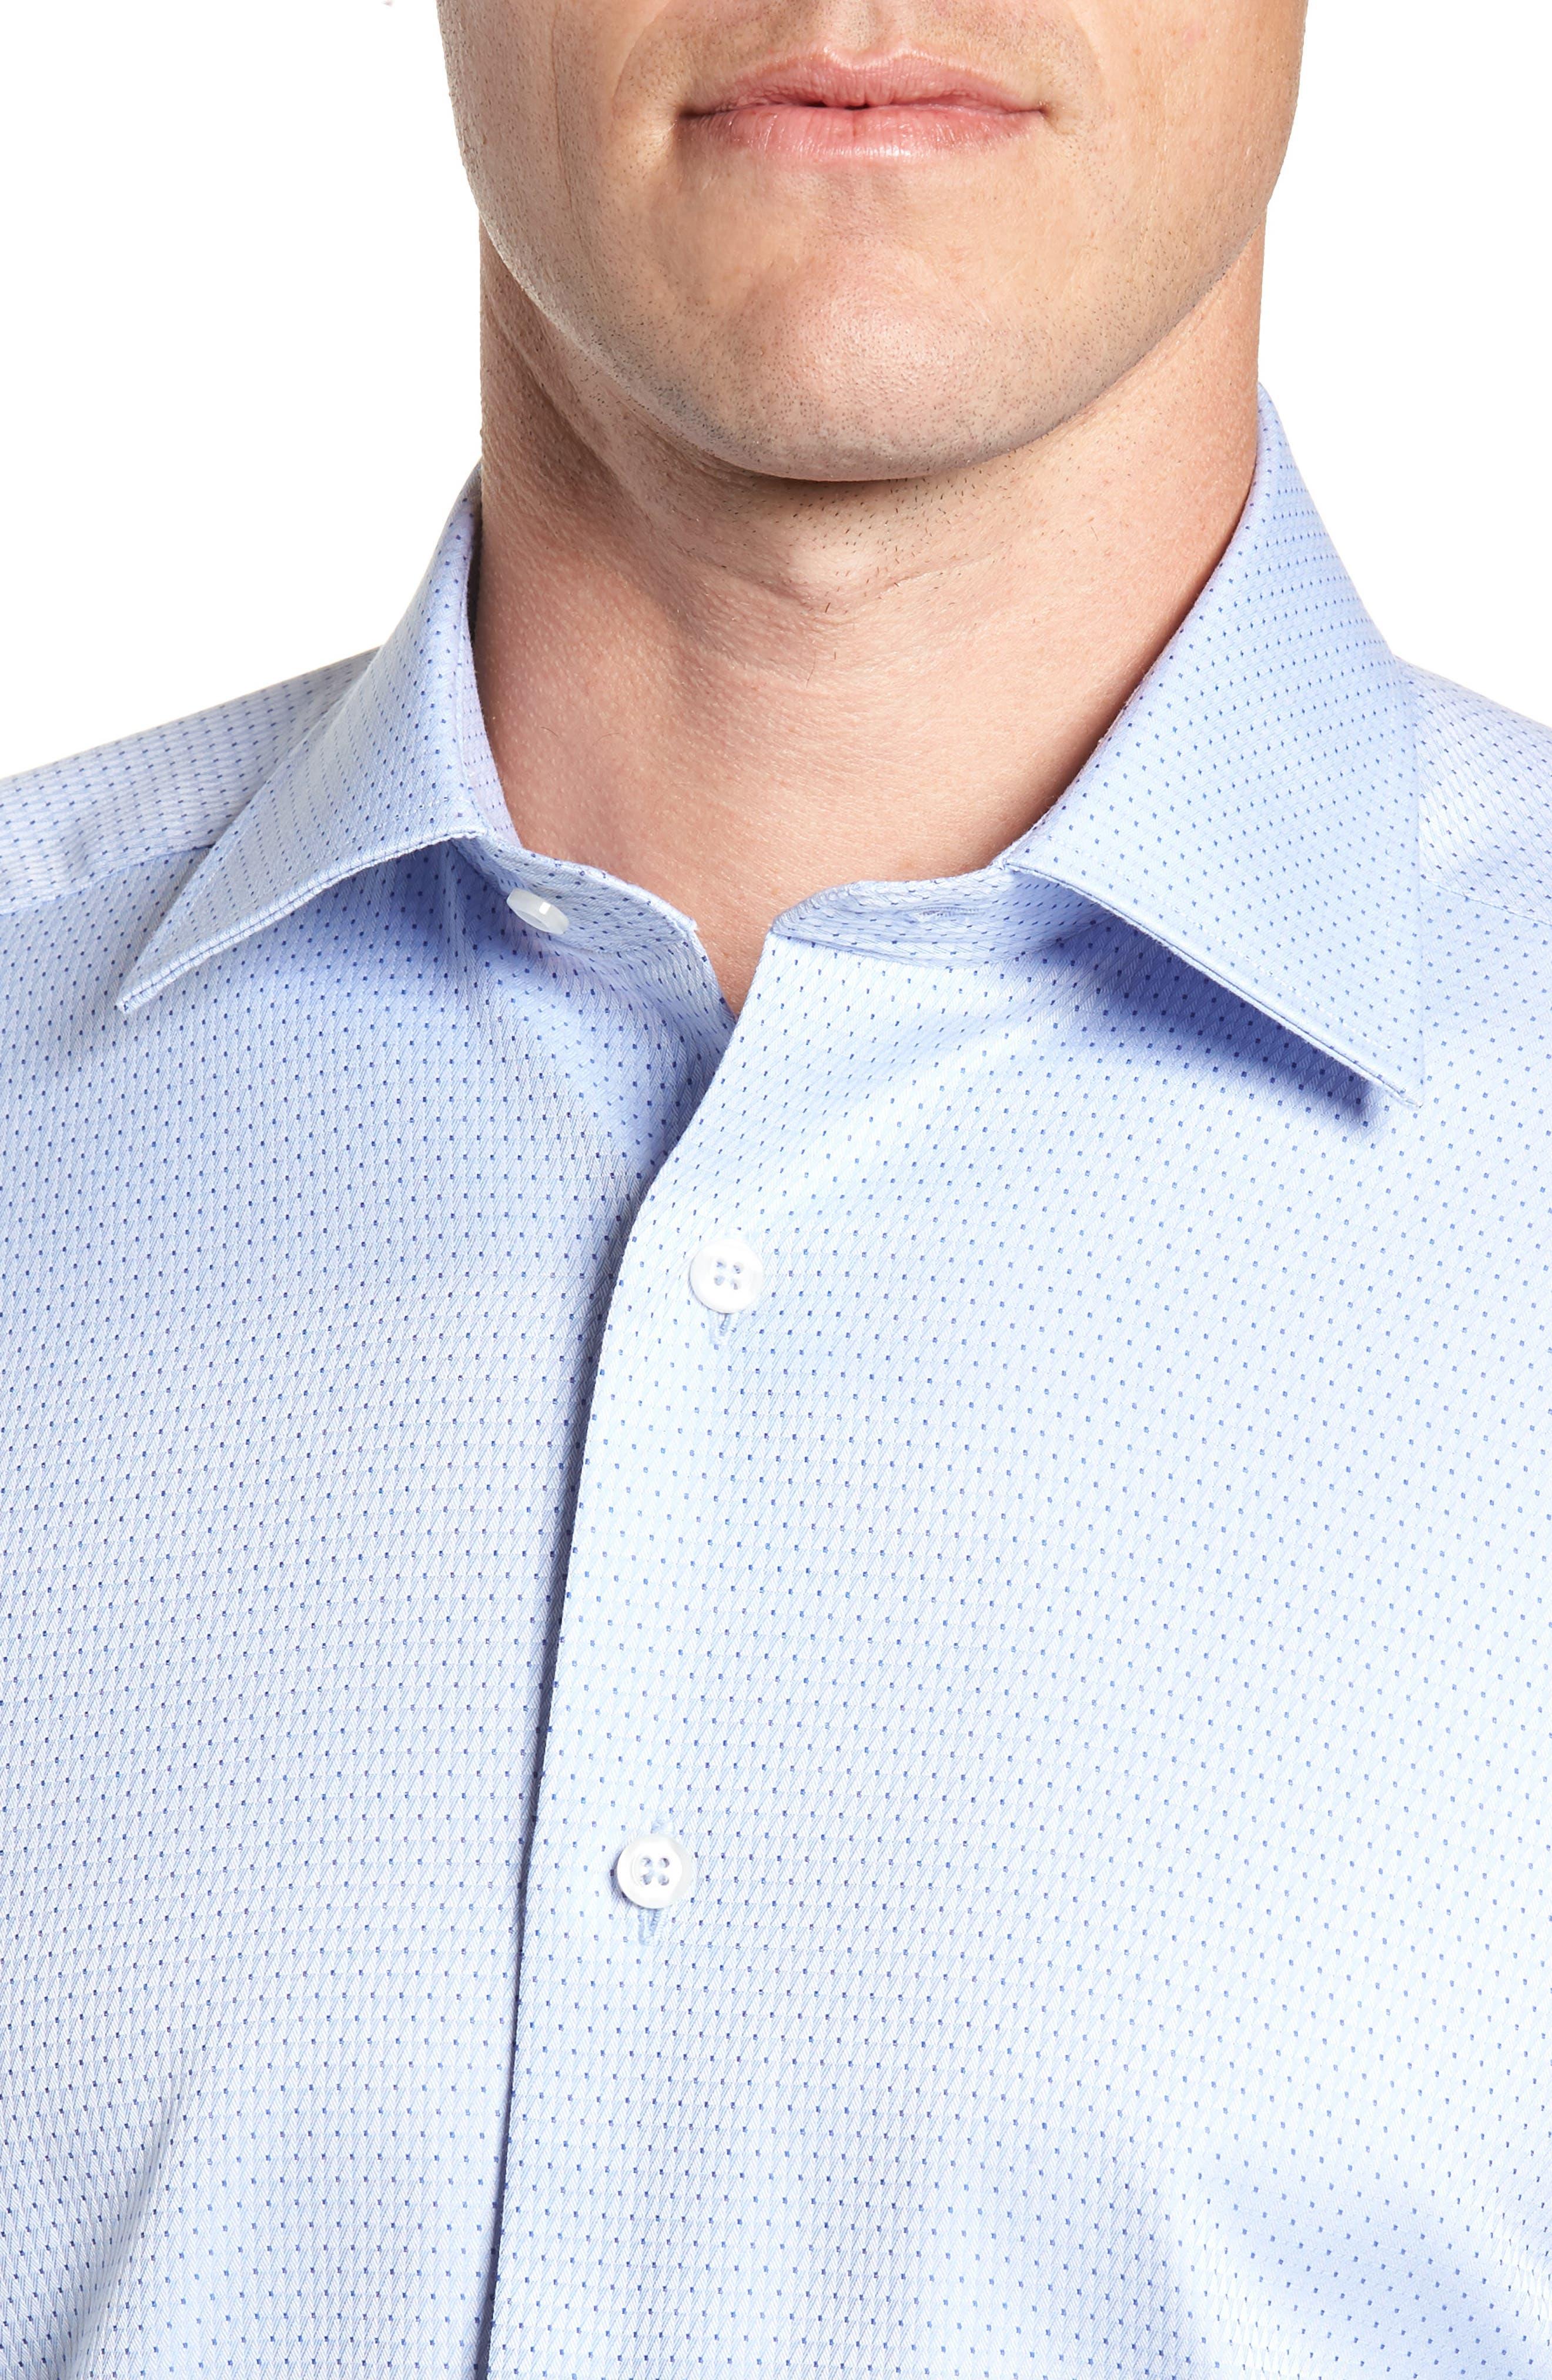 Trim Fit Check Dress Shirt,                             Alternate thumbnail 2, color,                             SKY/ NAVY